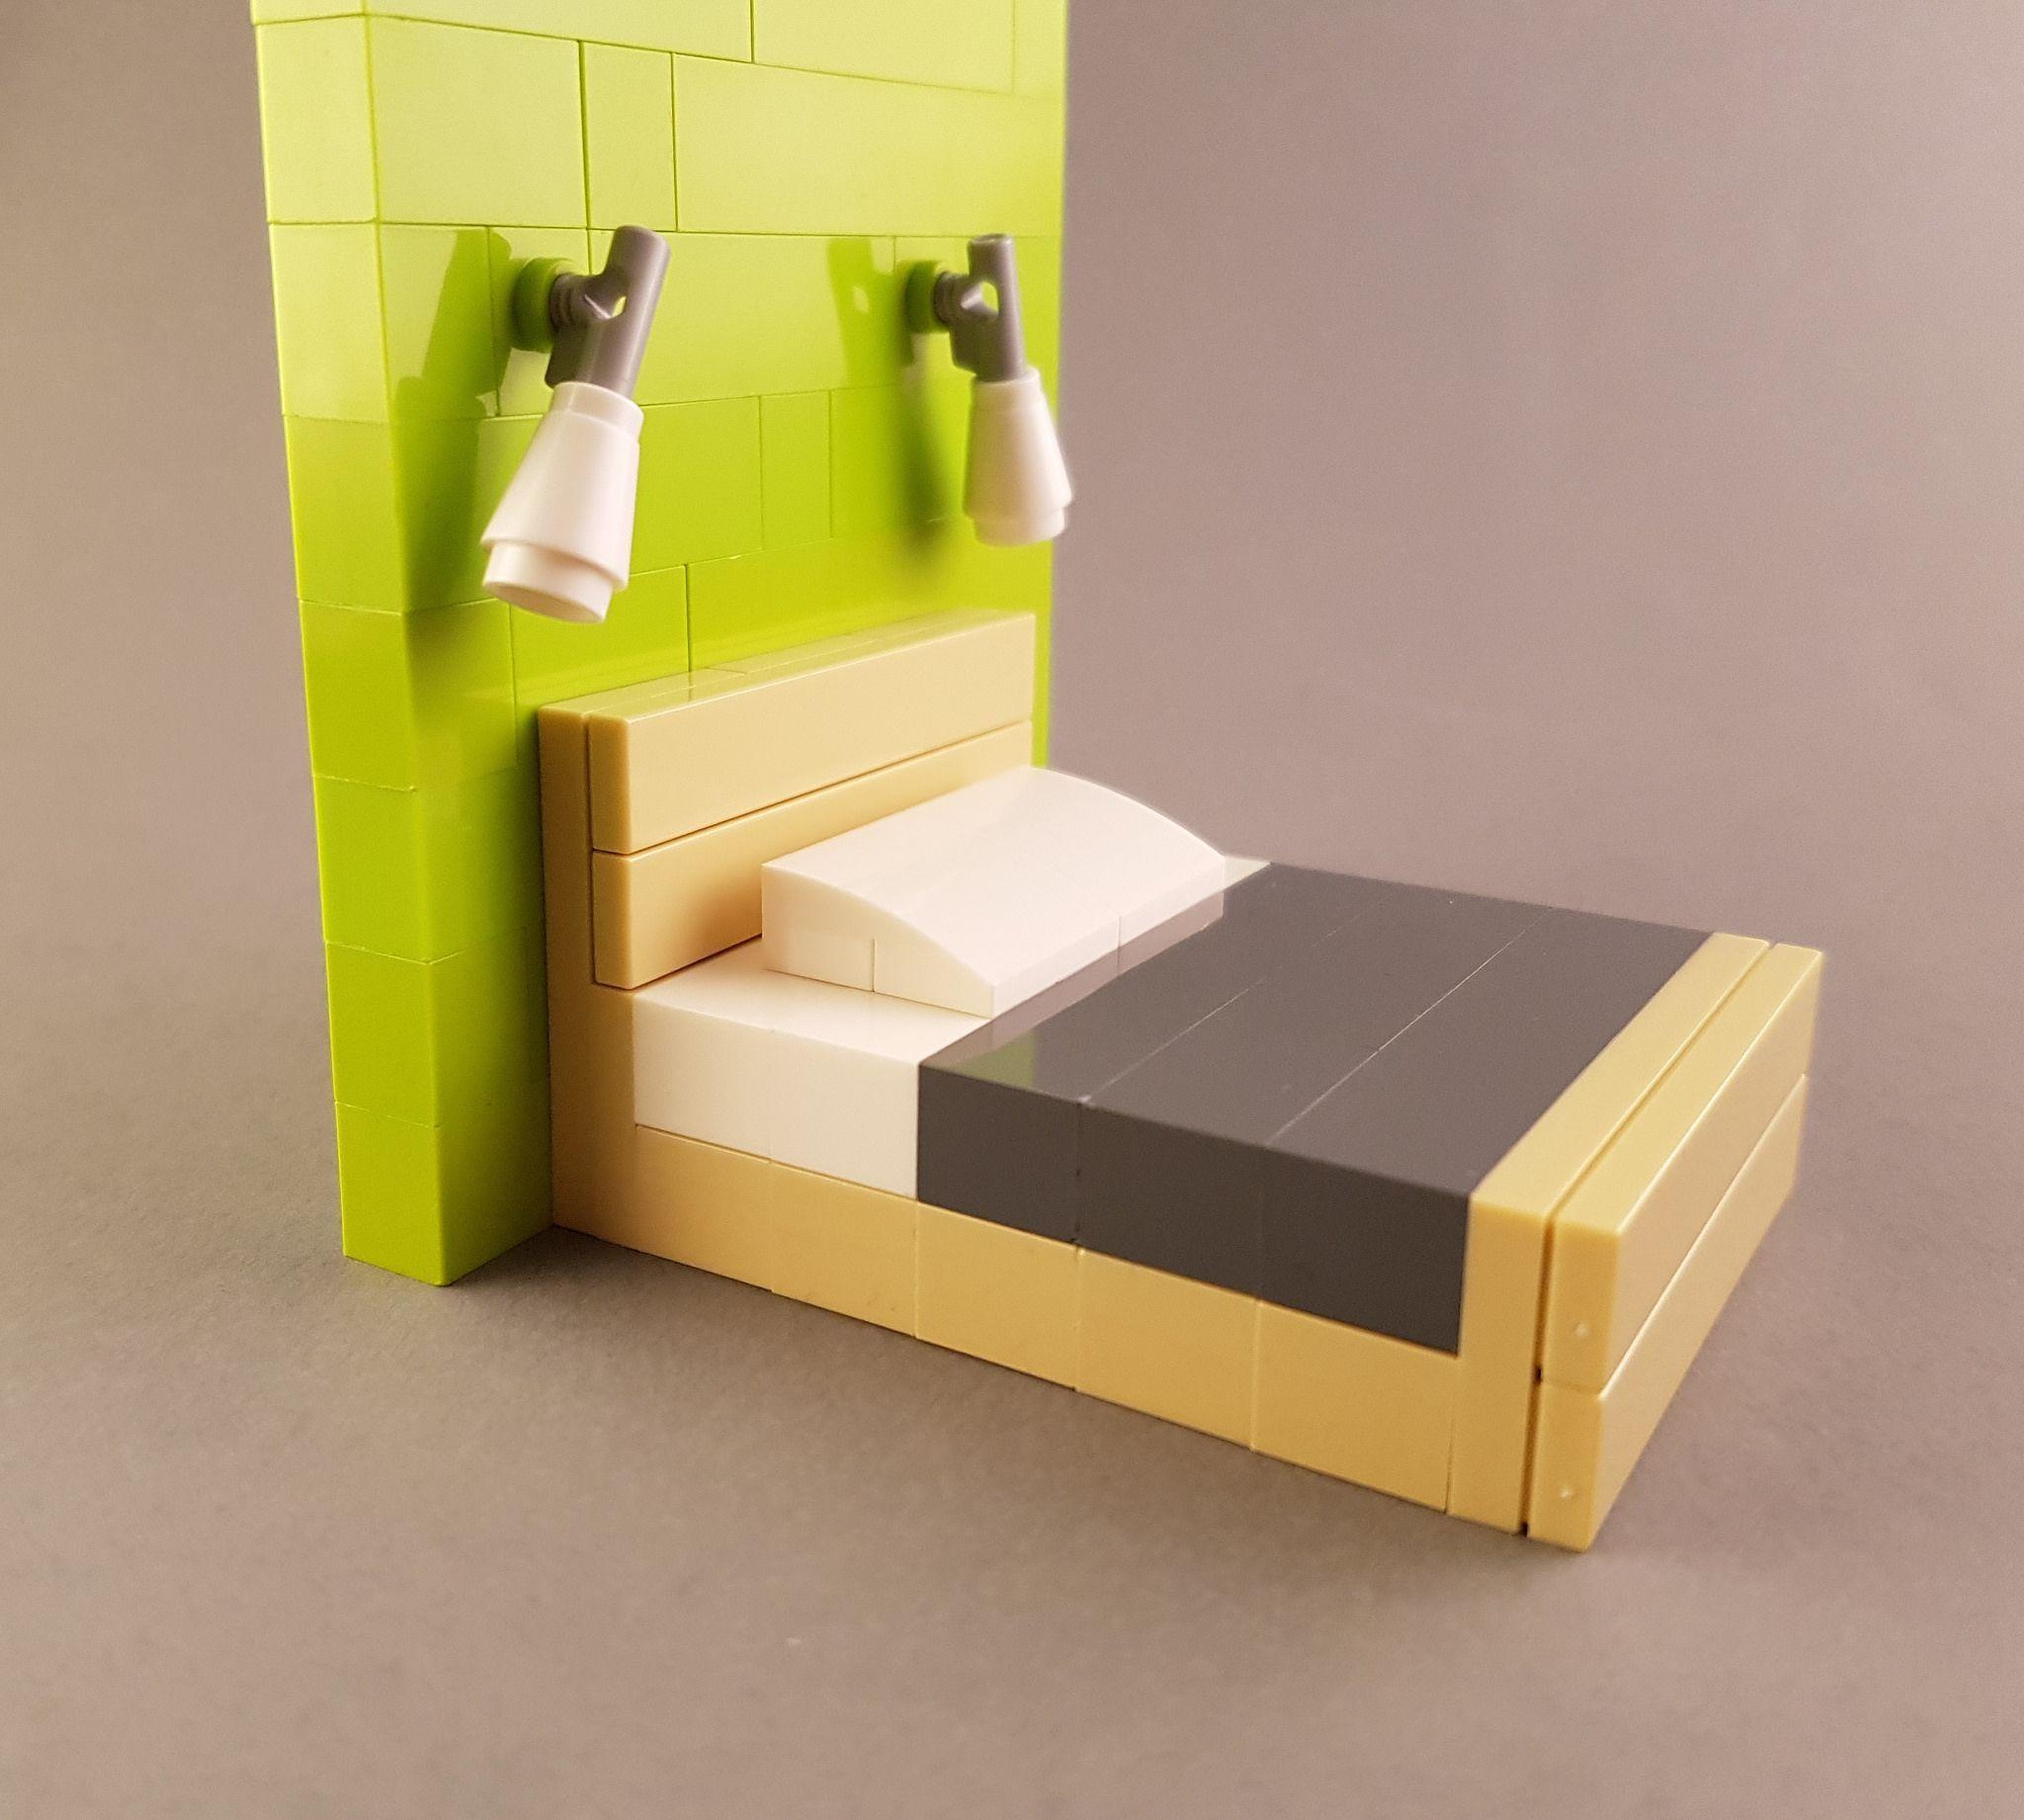 Photo of Bed MOC inspired by Scandinavian design II